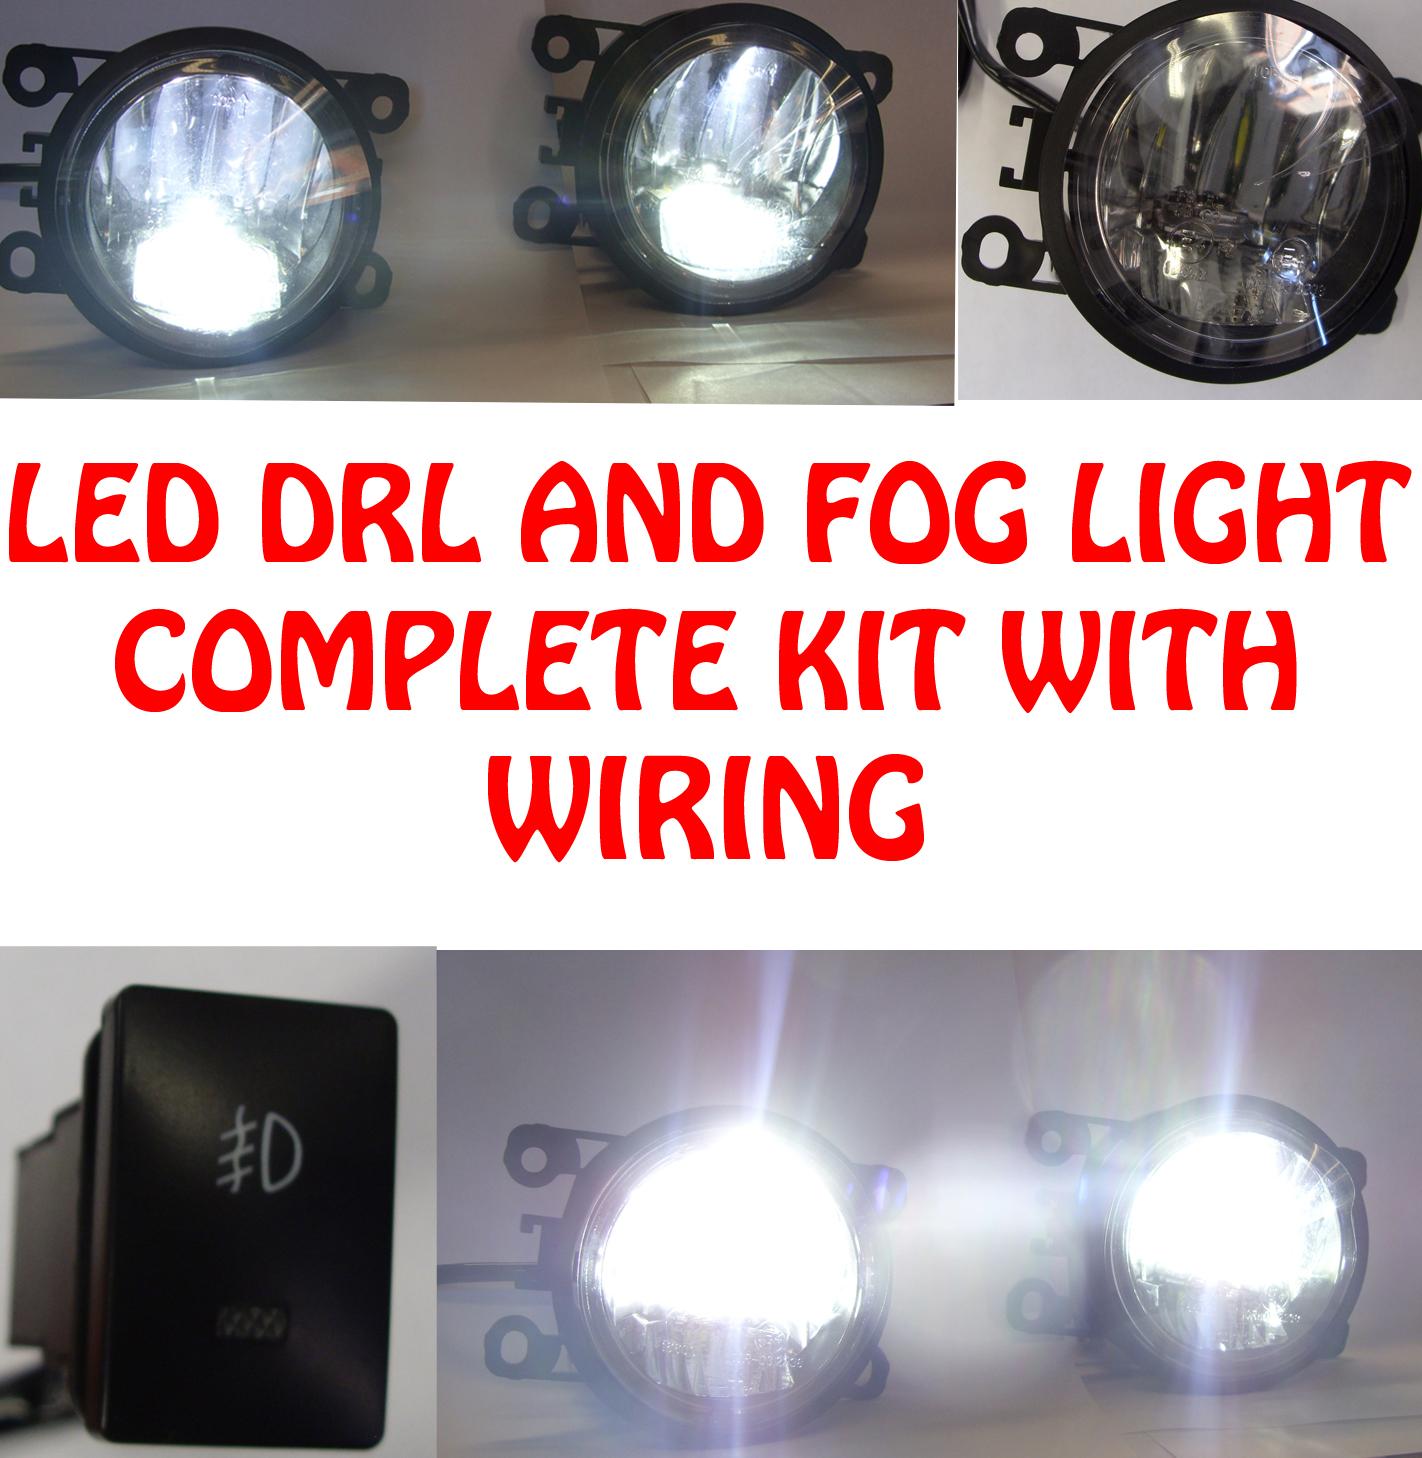 led drl and fog lights wiring and switch vauxhall astra h mk5 vxr 04 rh ebay com Fog Light Switch Wiring Fog Light Switch Wiring